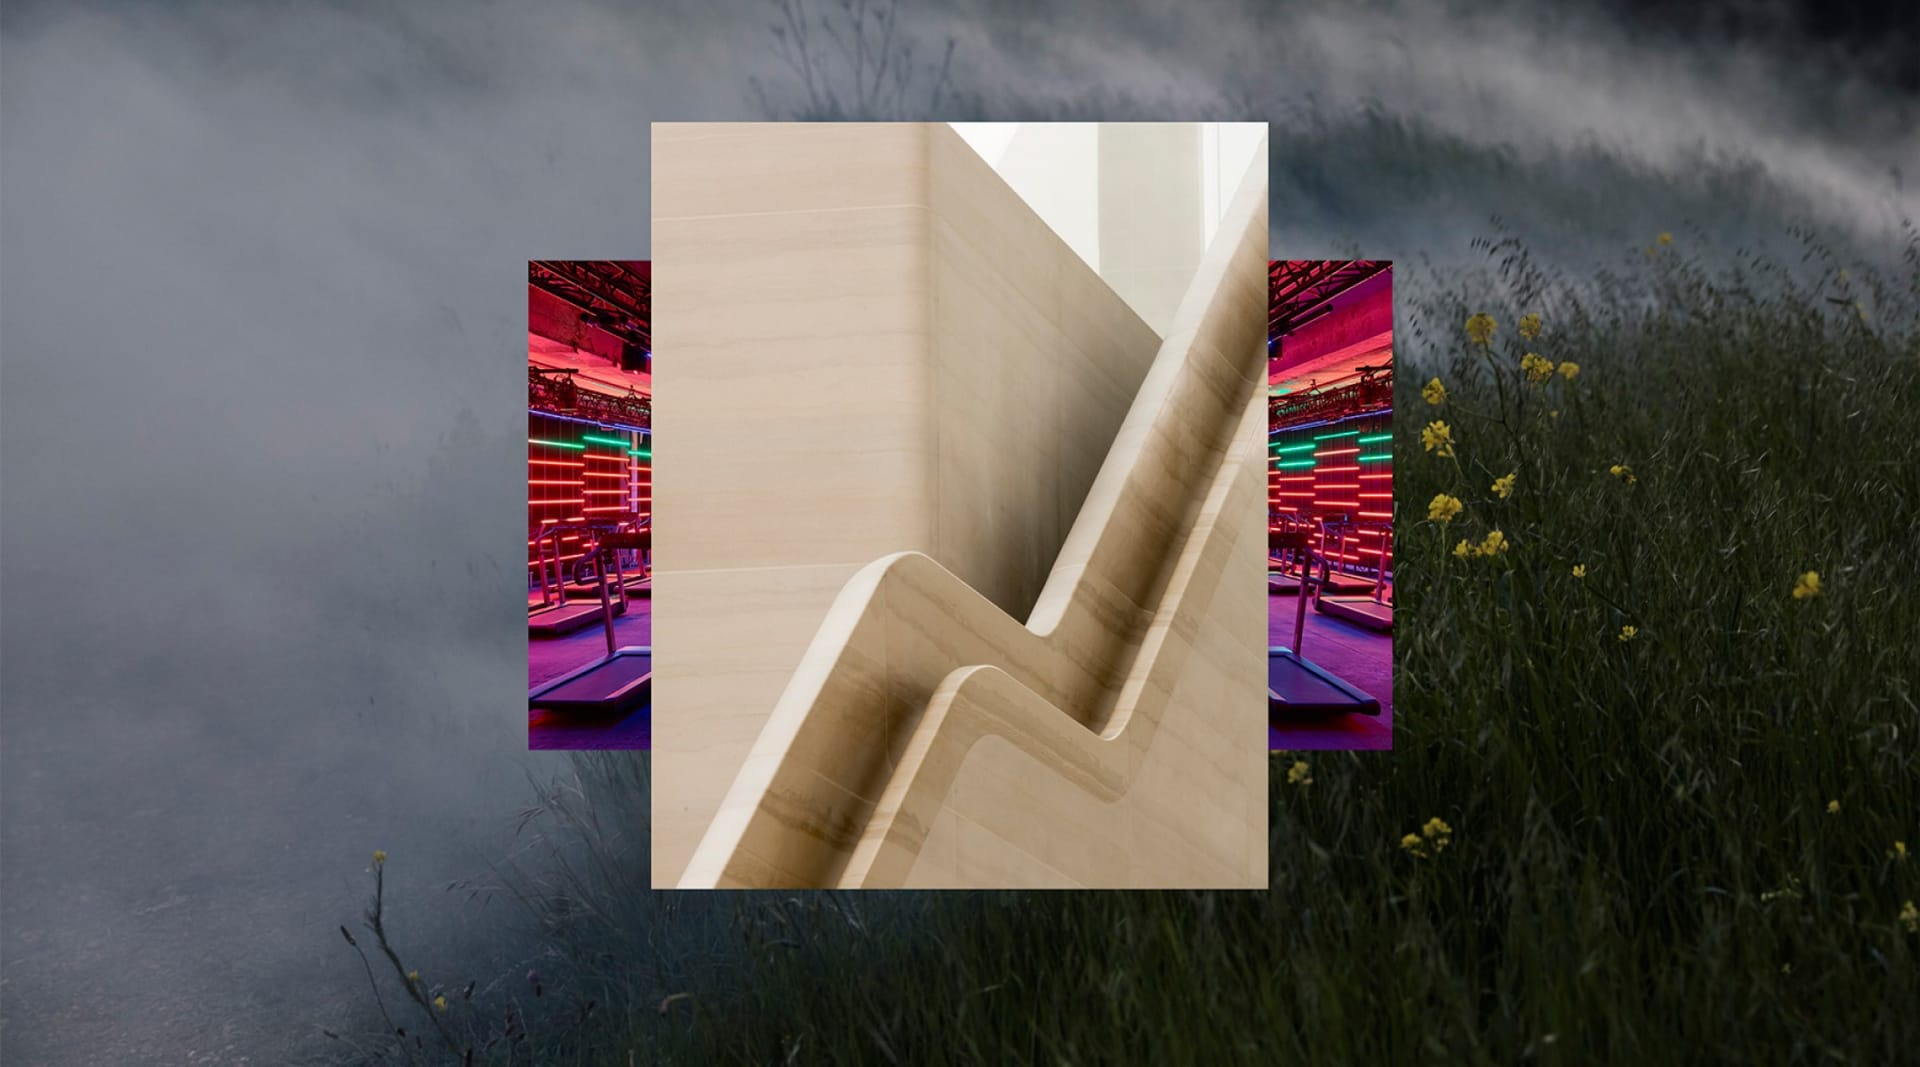 WEB JWT F100 COVER 2